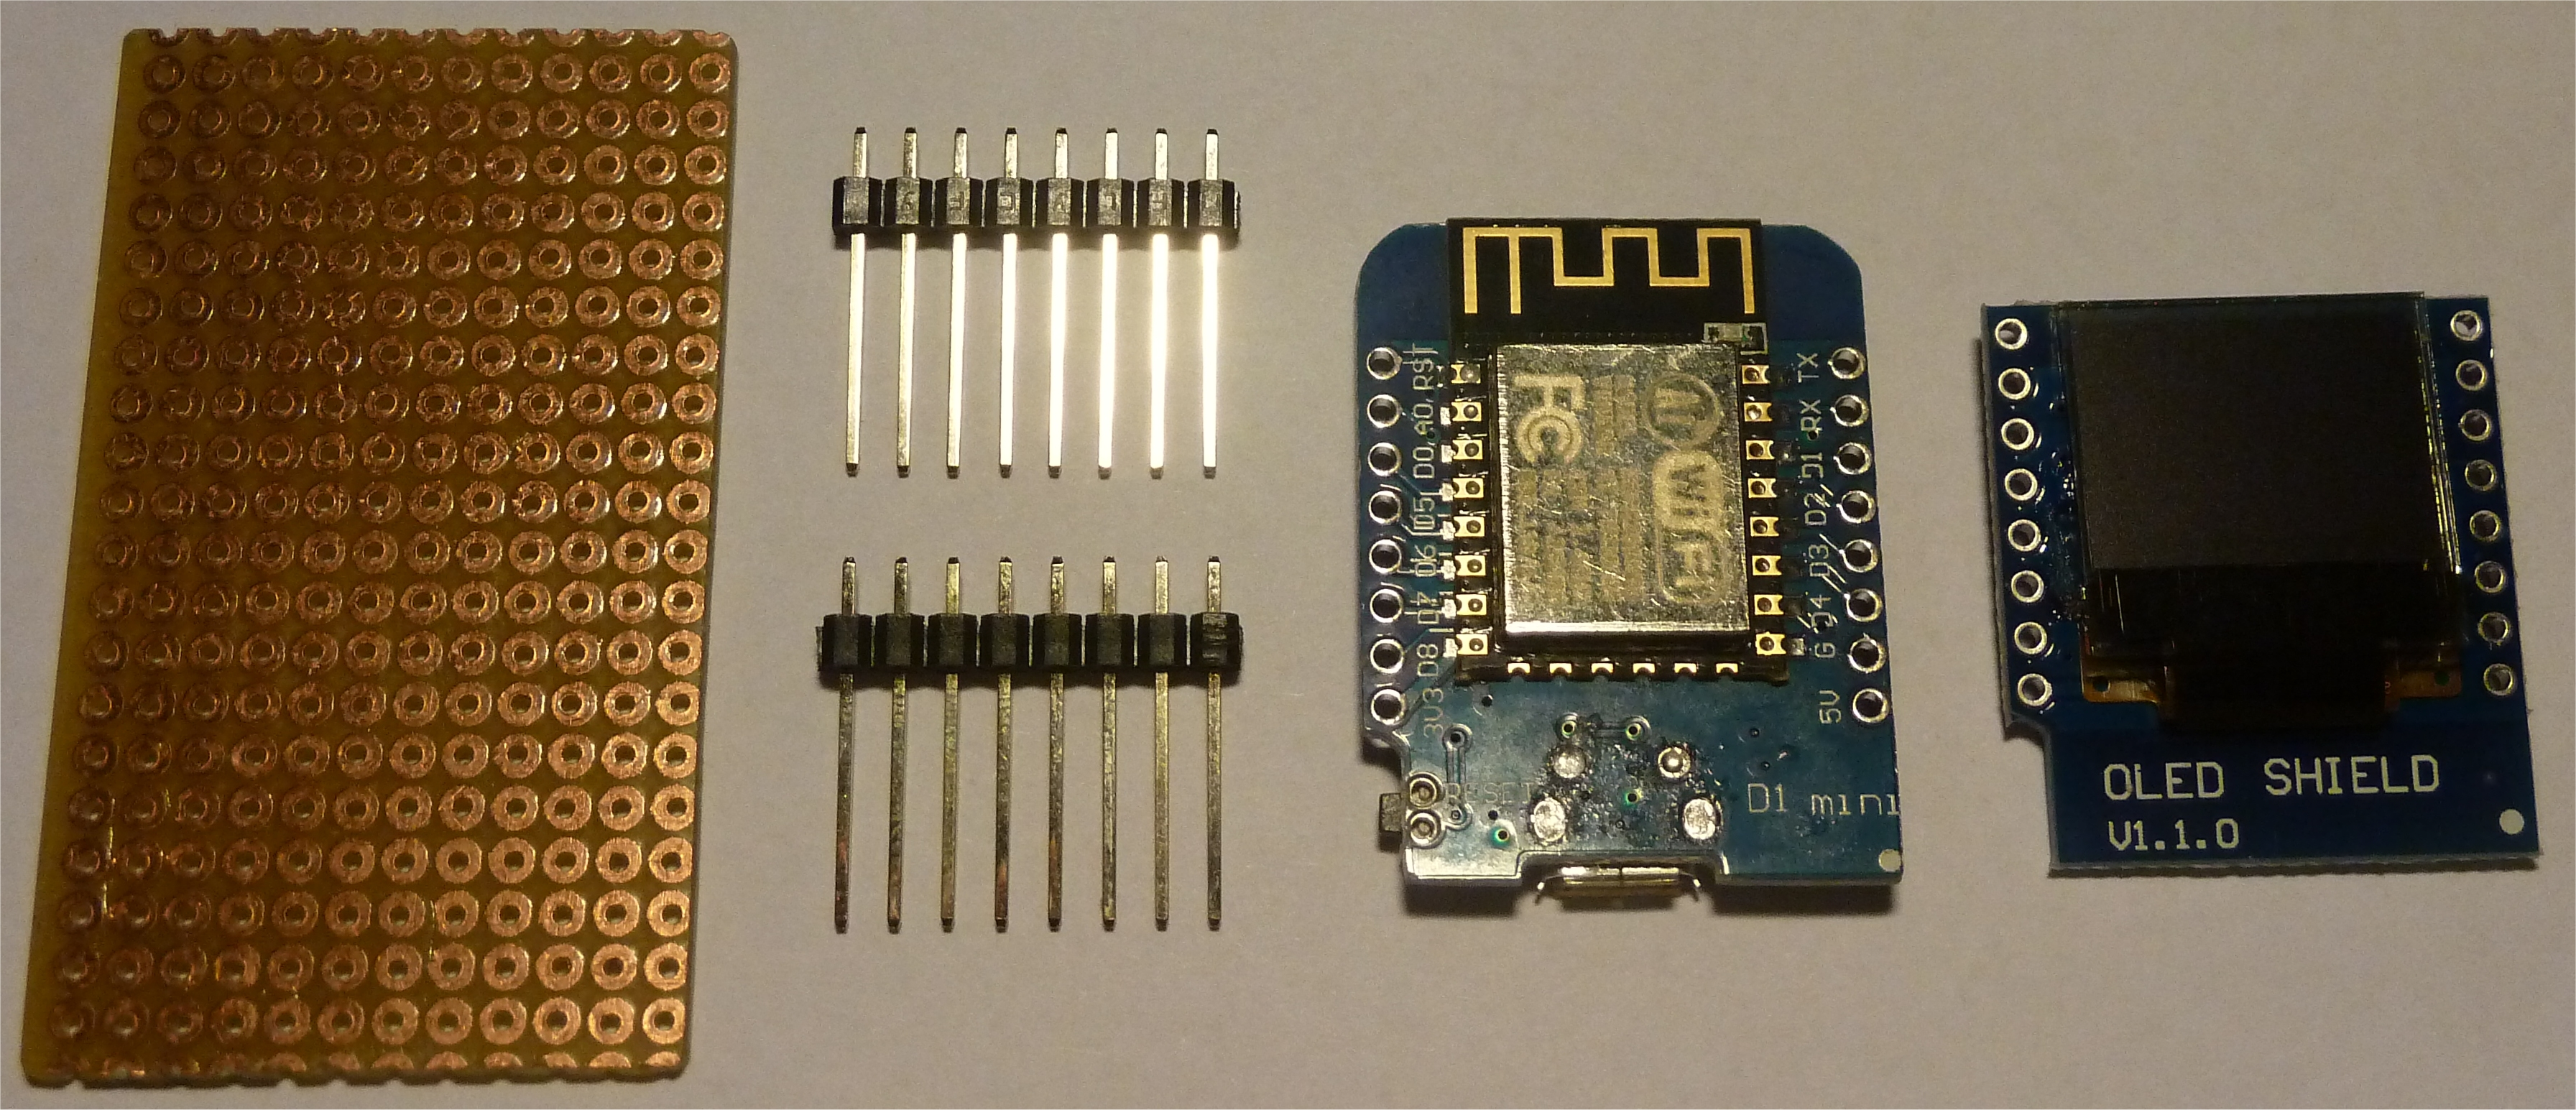 Componenti Luximetro WeMos D1 Wifi OLED